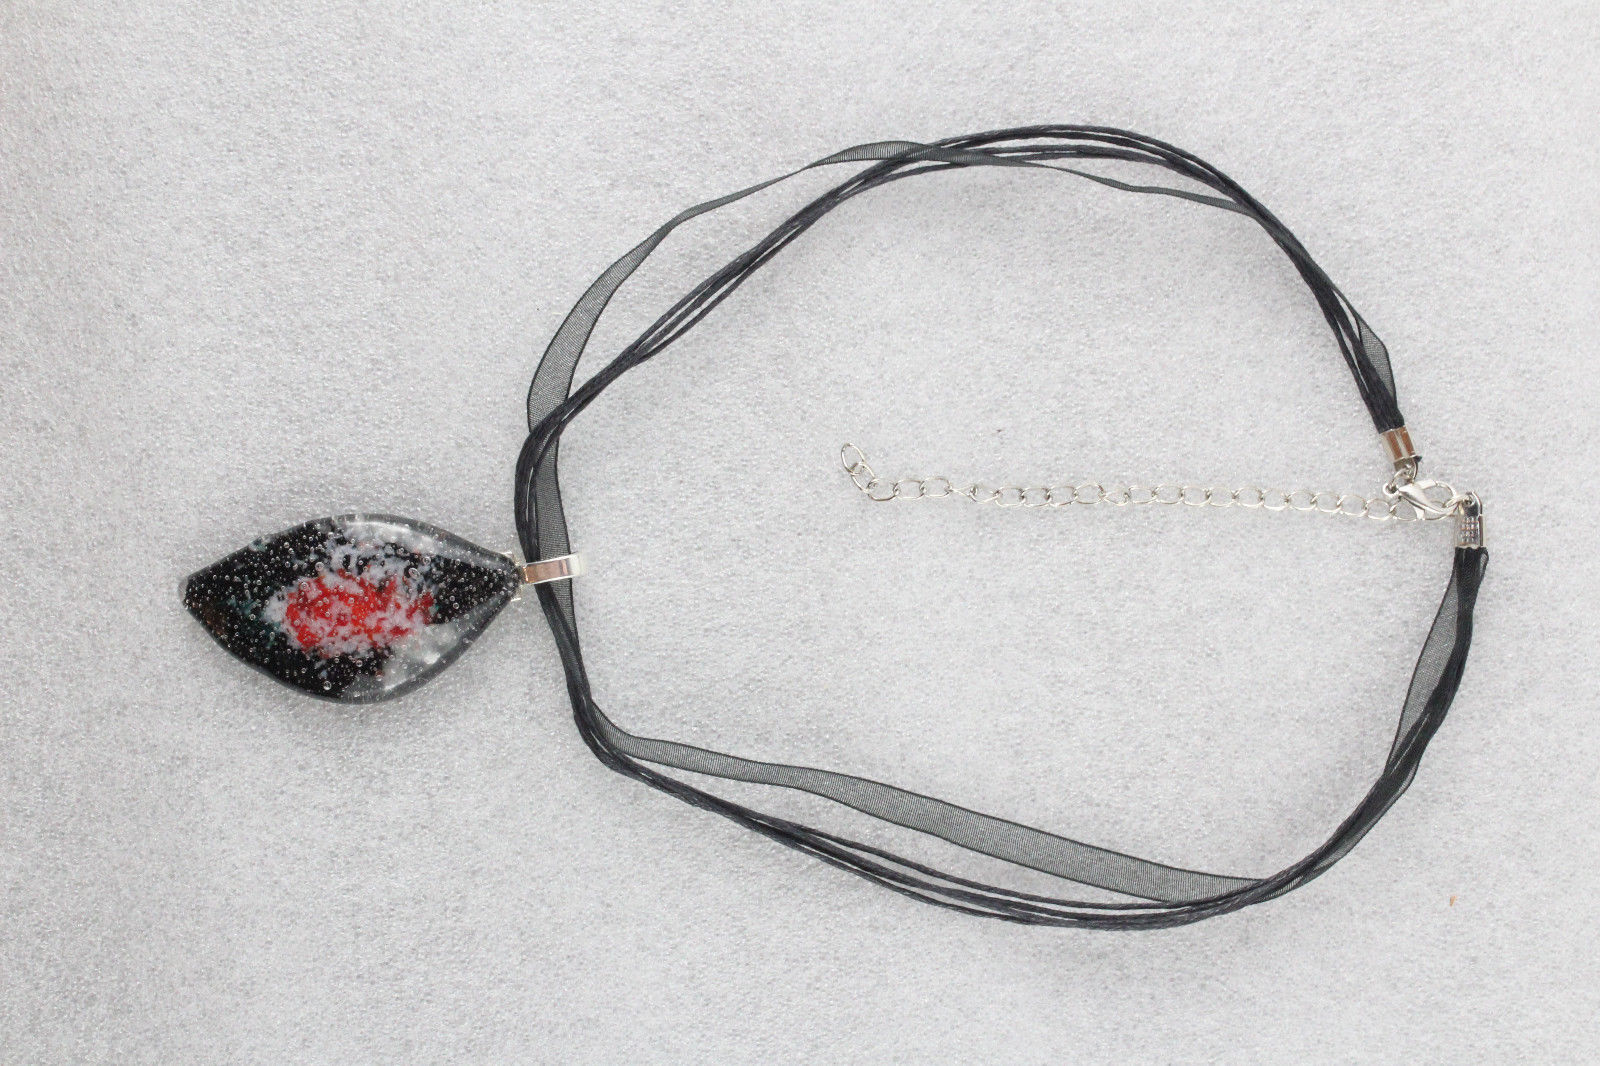 Elegant Handmade Casual Coloured Fused Glass Pendant Necklace + Cord #EM007